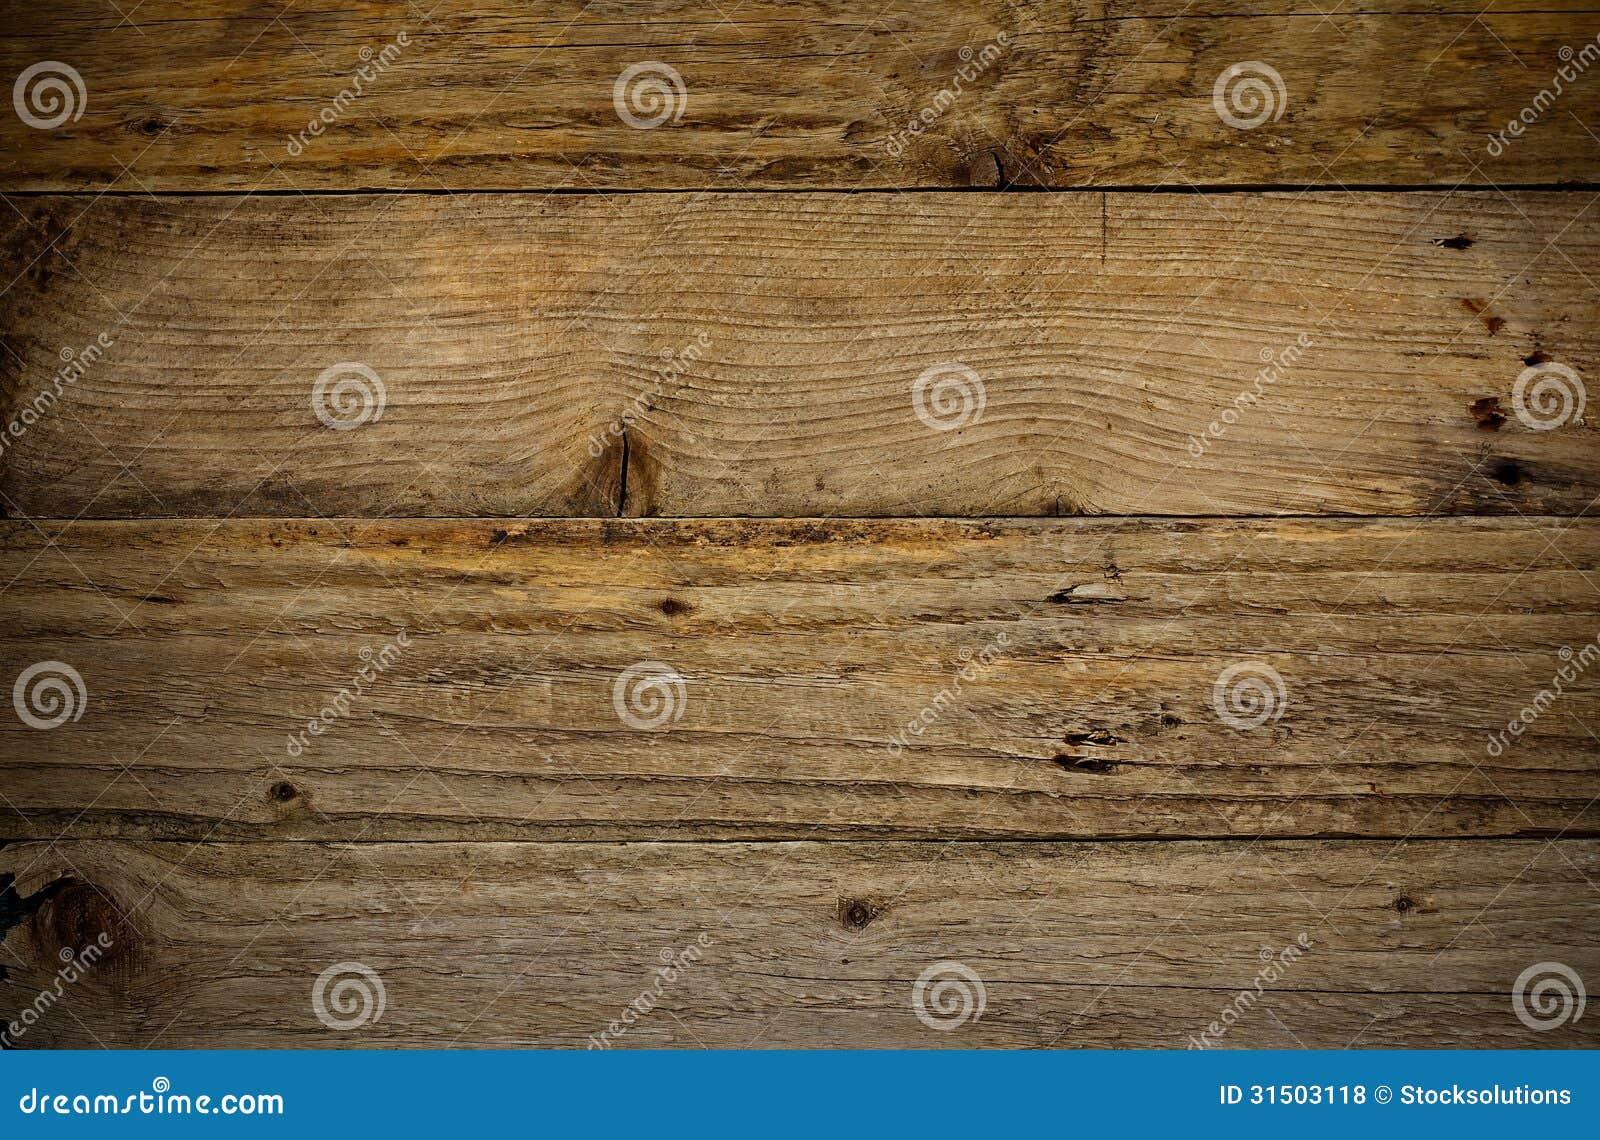 Rustic Wood Plank : Rustic Wood Planks